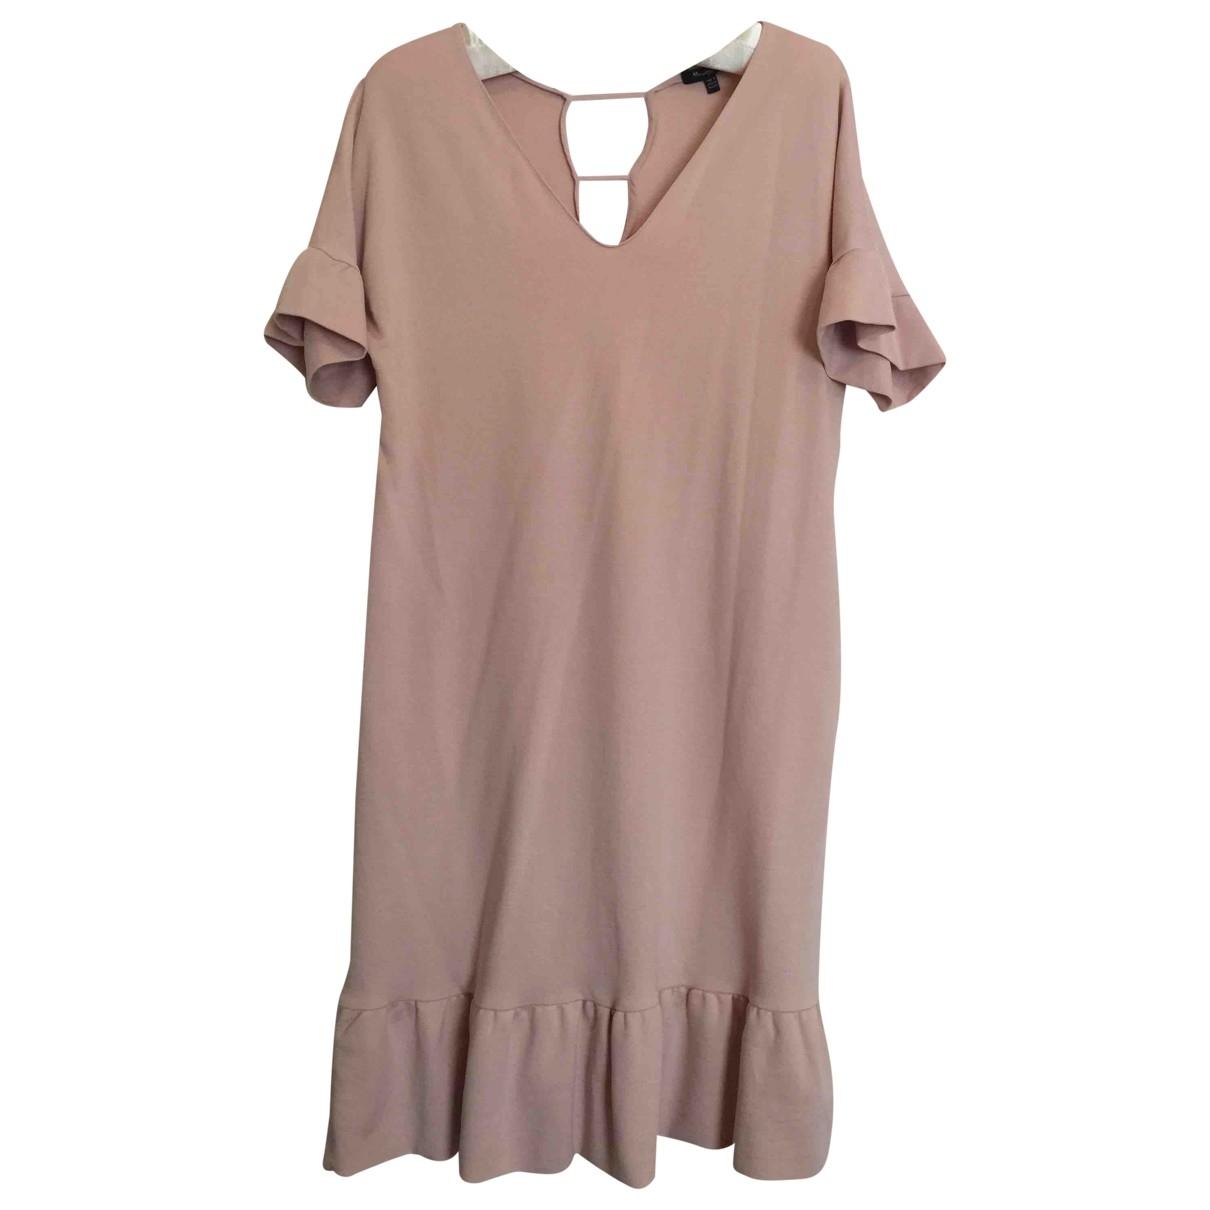 Massimo Dutti \N Pink Cotton - elasthane dress for Women M International